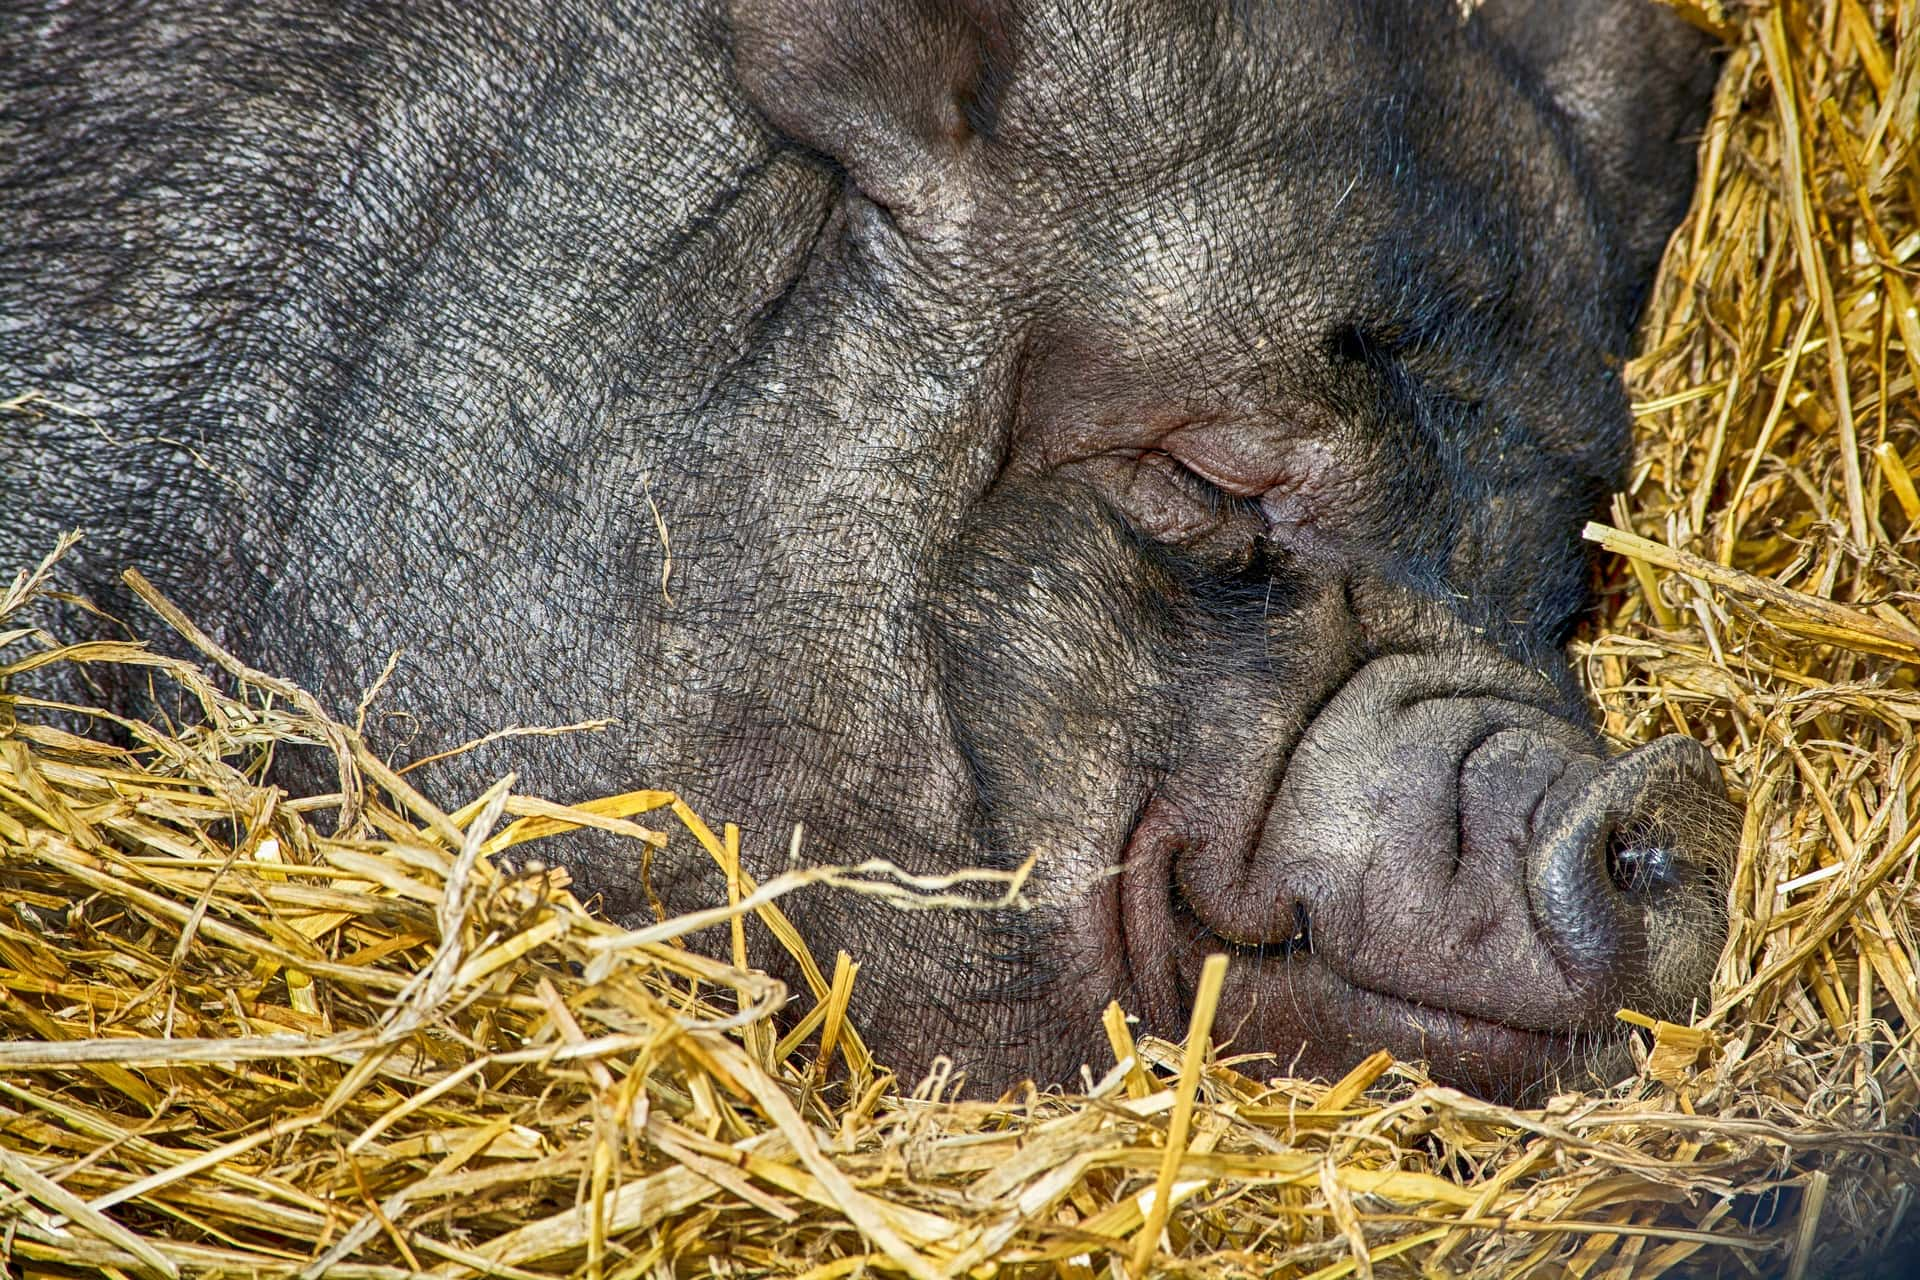 The Pig's Nest